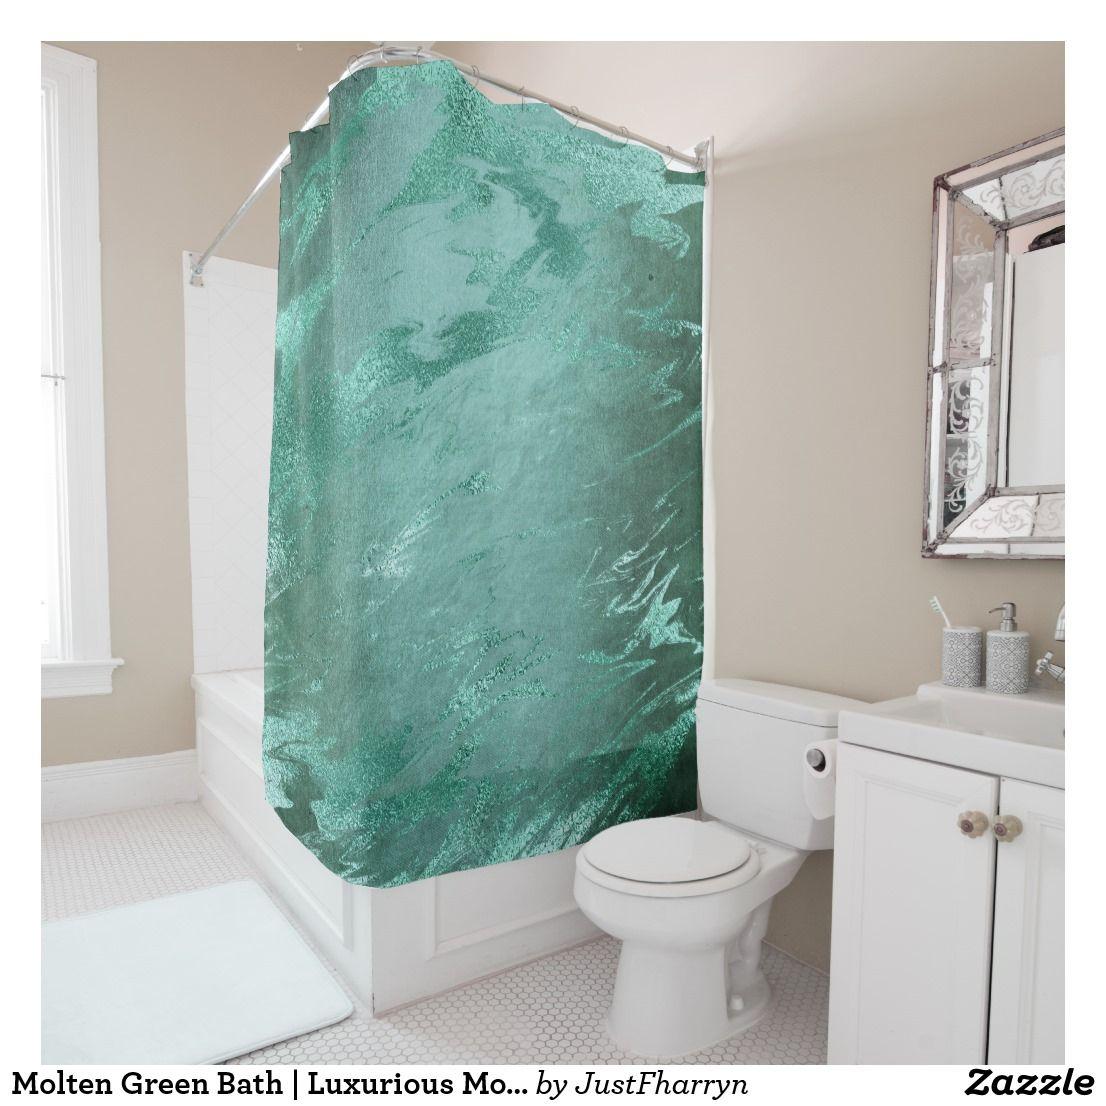 Molten Jade Emerald Green Luxury Marble Shower Curtain Zazzle Com Boho Shower Curtain Patterned Shower Curtain Mermaid Shower Curtain